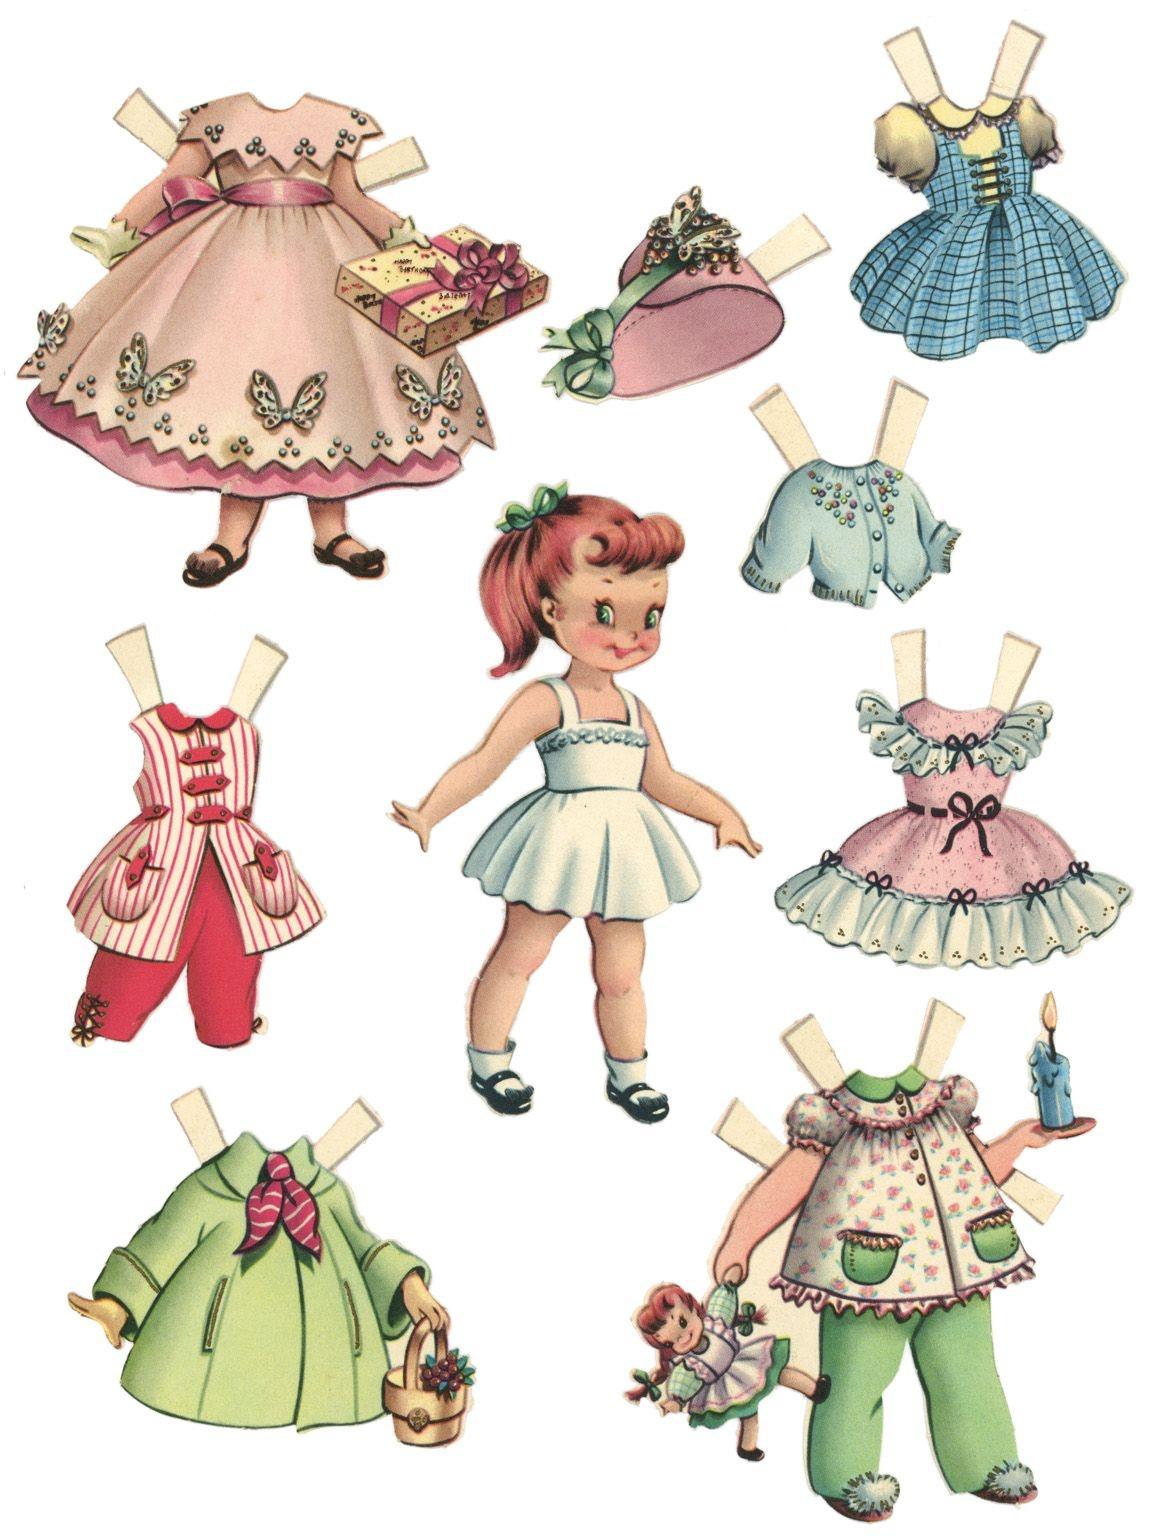 10 Free Printable Paper Dolls | Paper Dolls | Paper Dolls Printable - Free Printable Paper Dolls